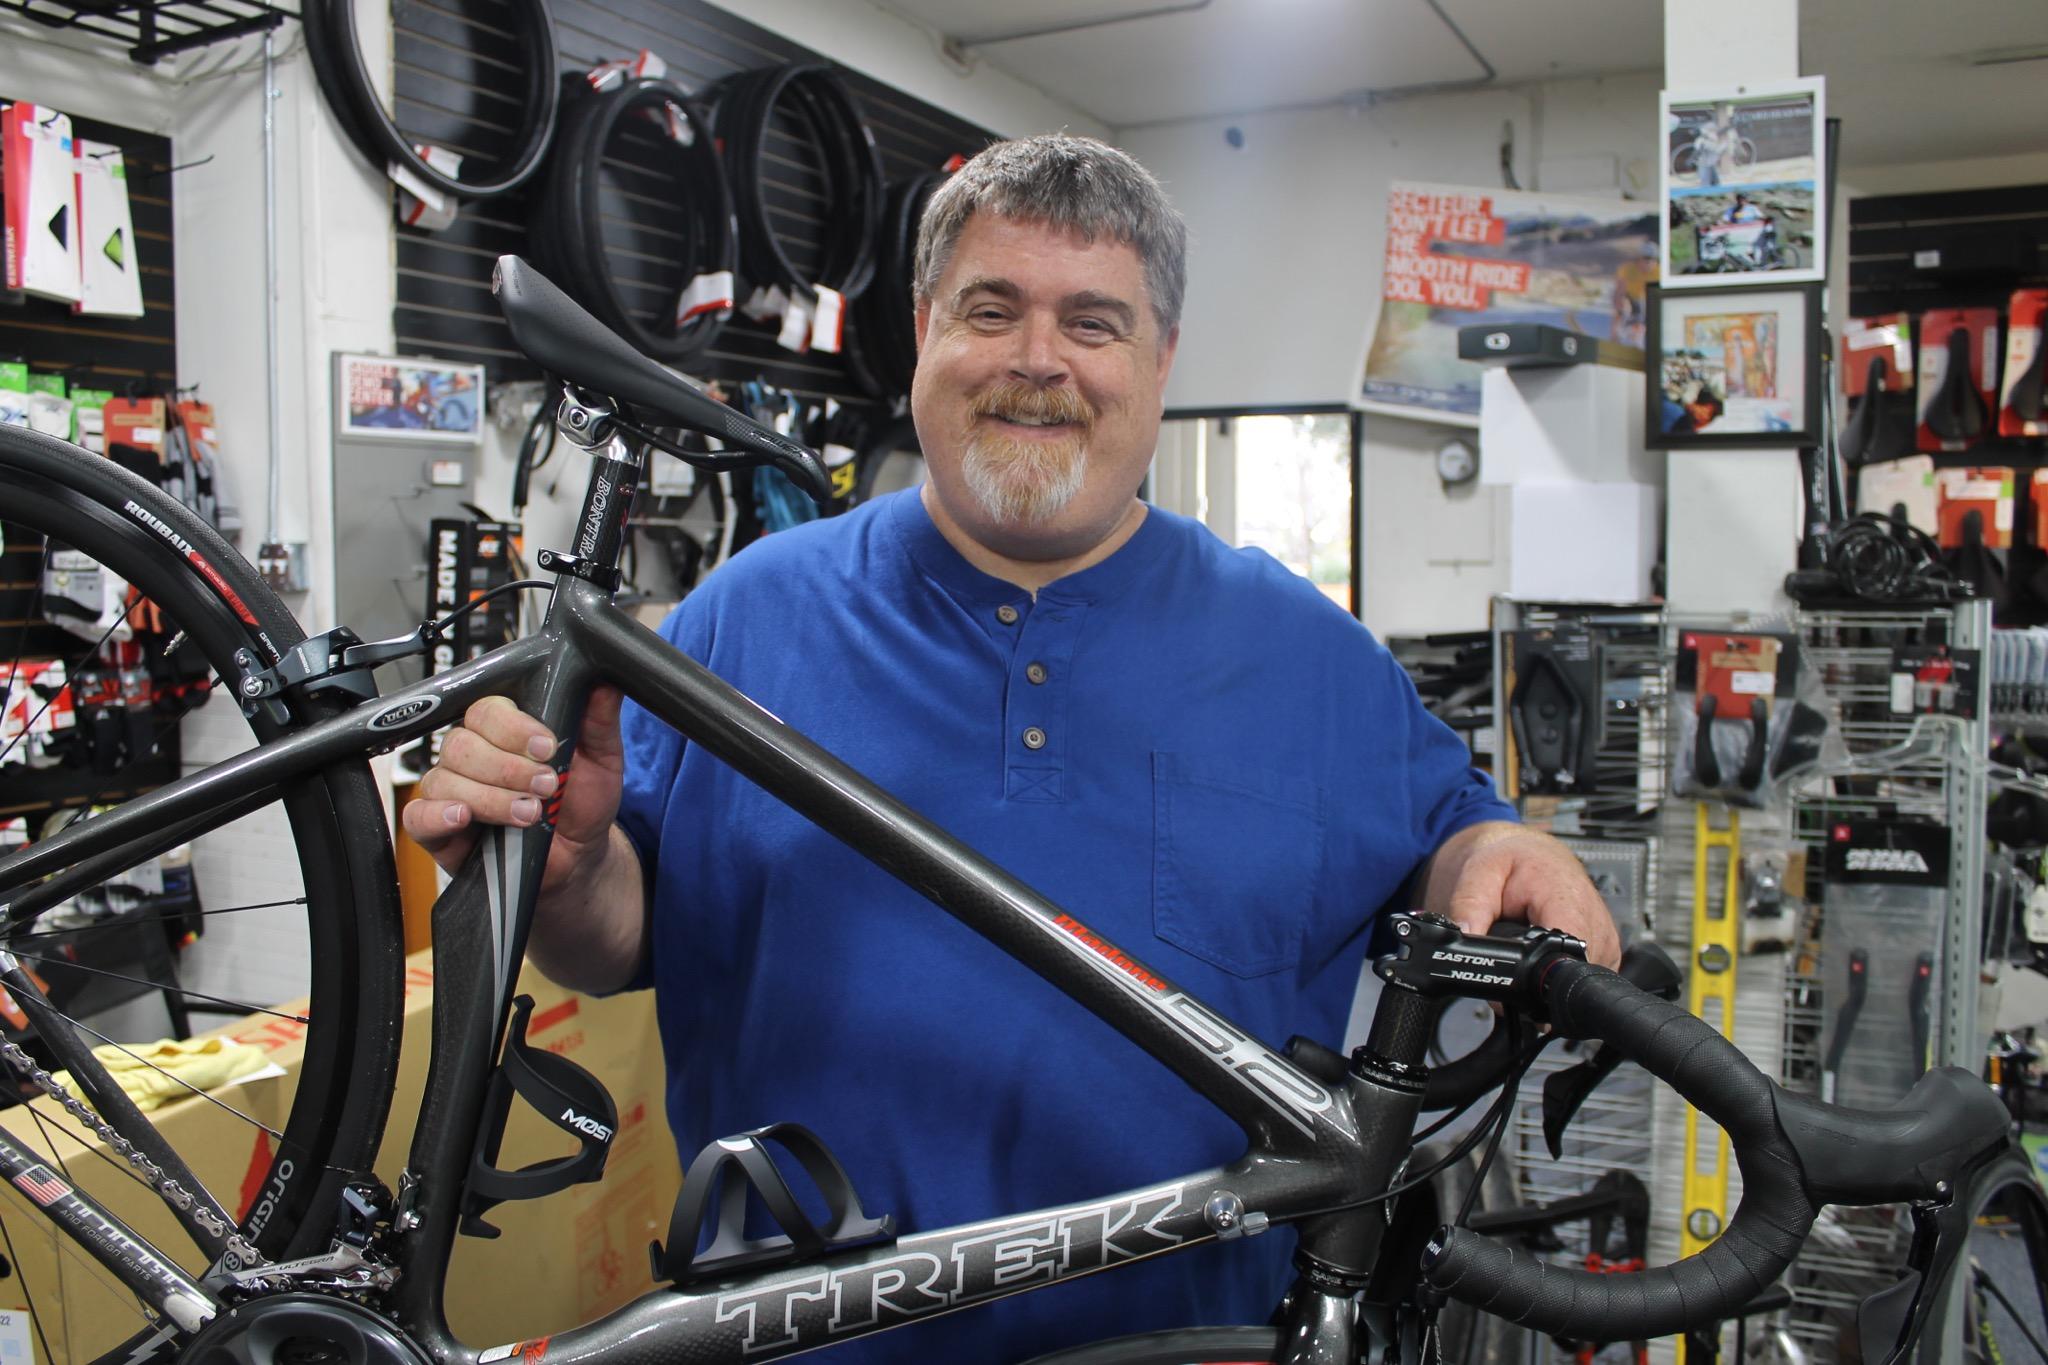 Open Air Bicycle Ventura Jeff Fuqua